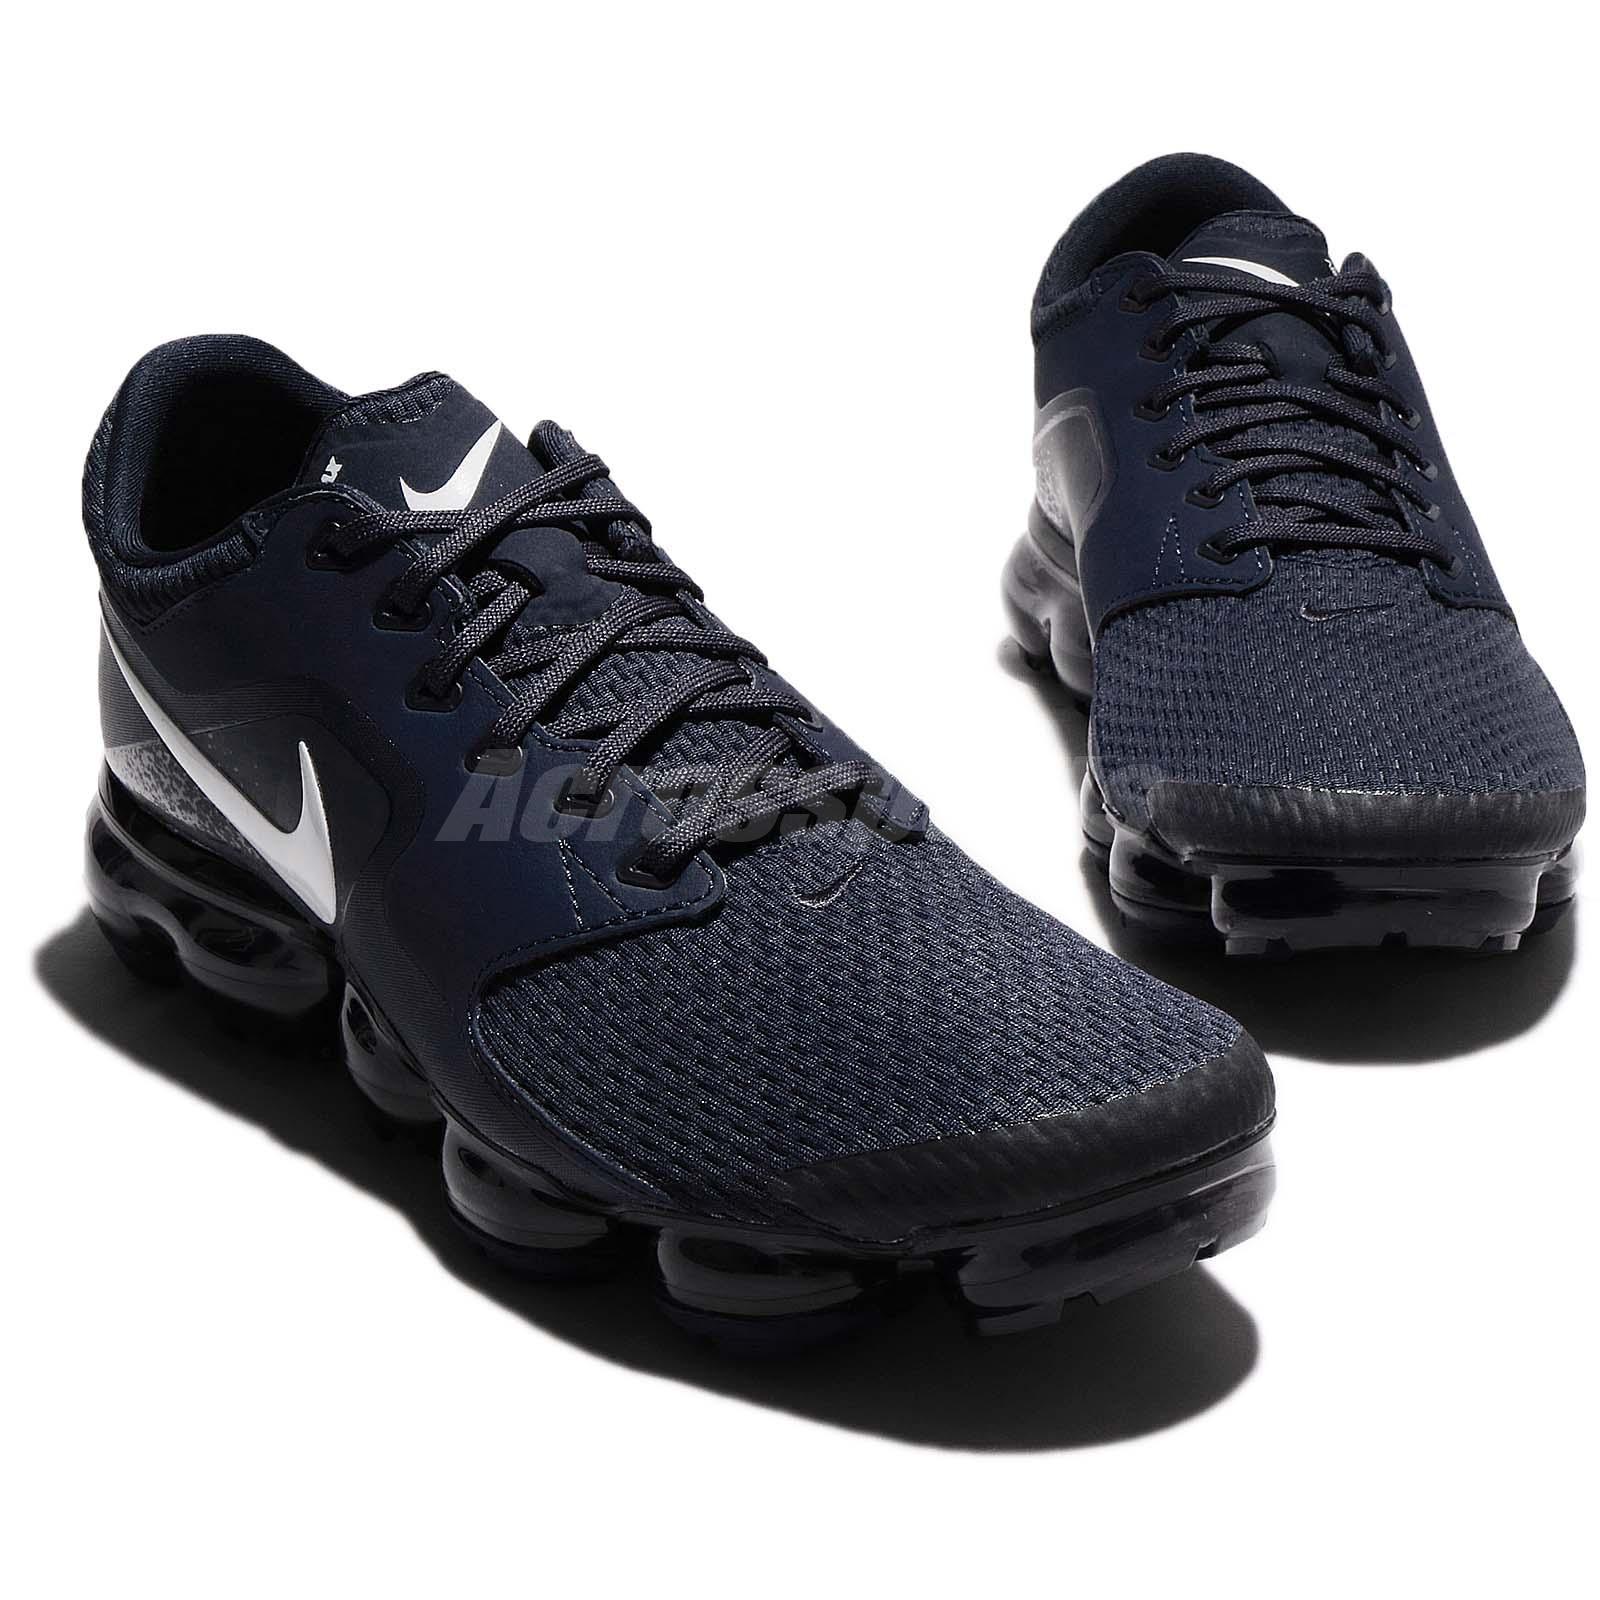 Nike Air Vapormax Thunder Blue White Mesh Men Running Shoes Sneakers